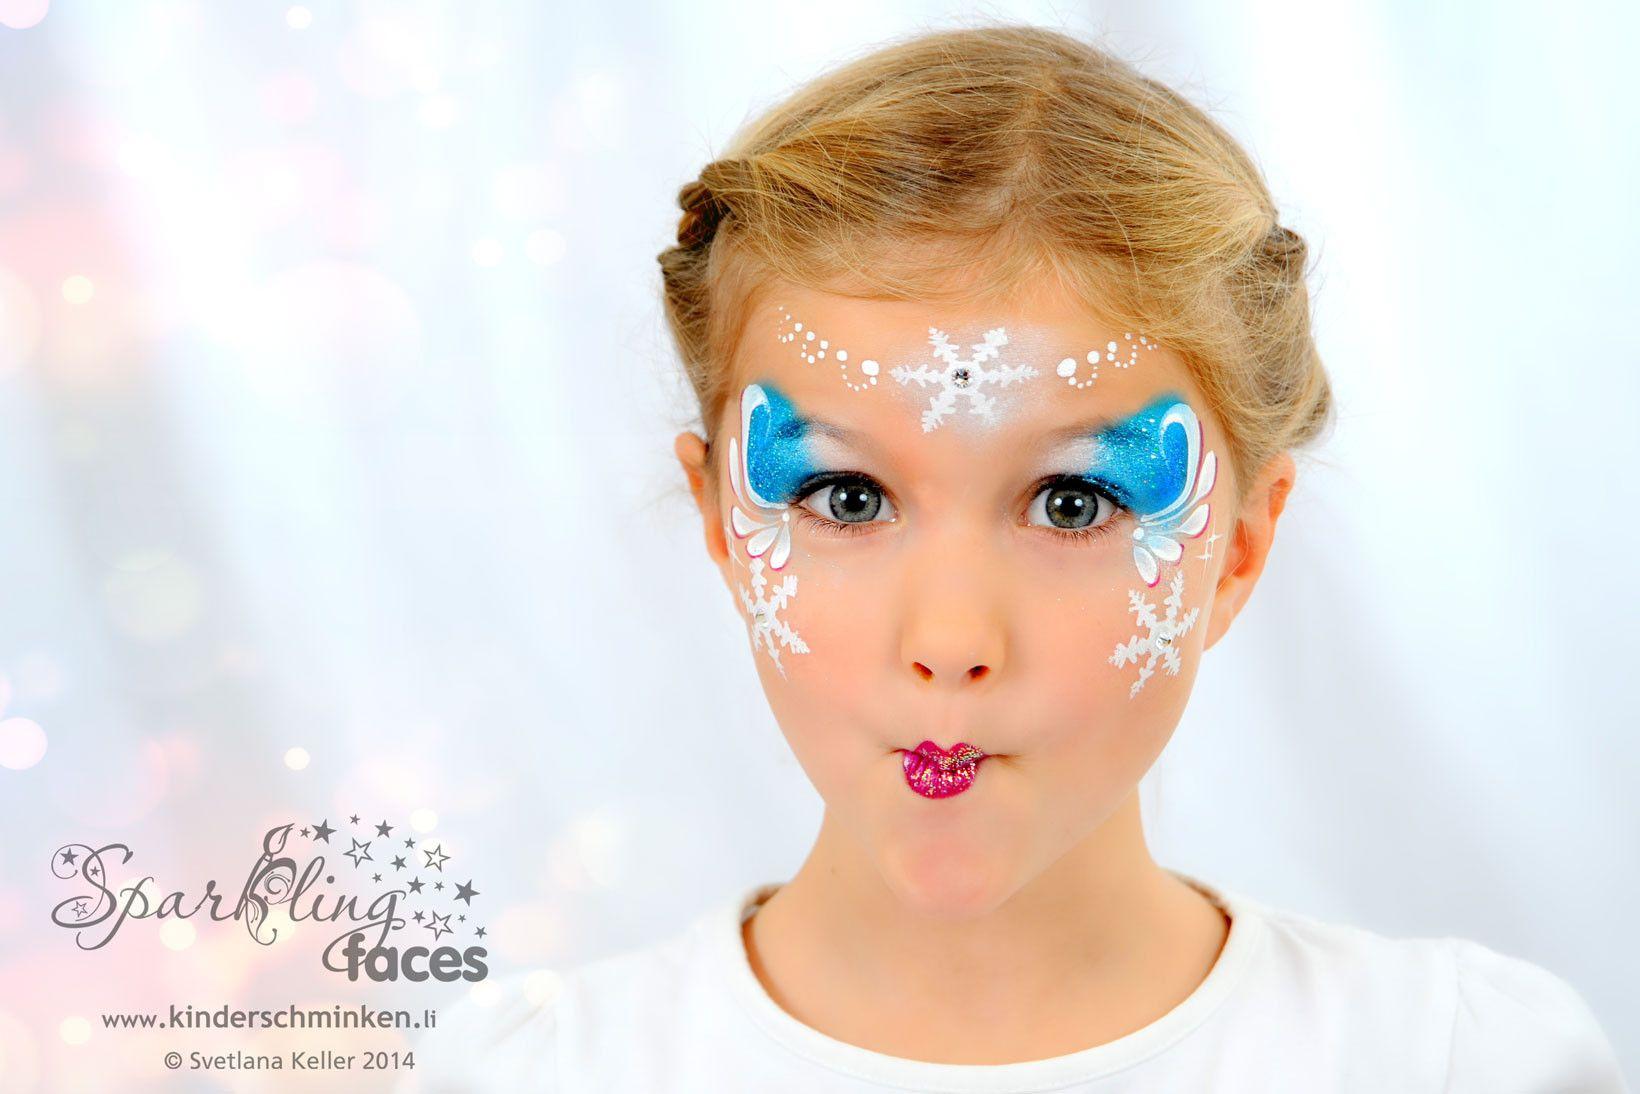 Galerie Sparkling Faces Kinderschminken Farbenverkauf Kurse Bemalte Gesichter Kinderschminken Kinder Schminken